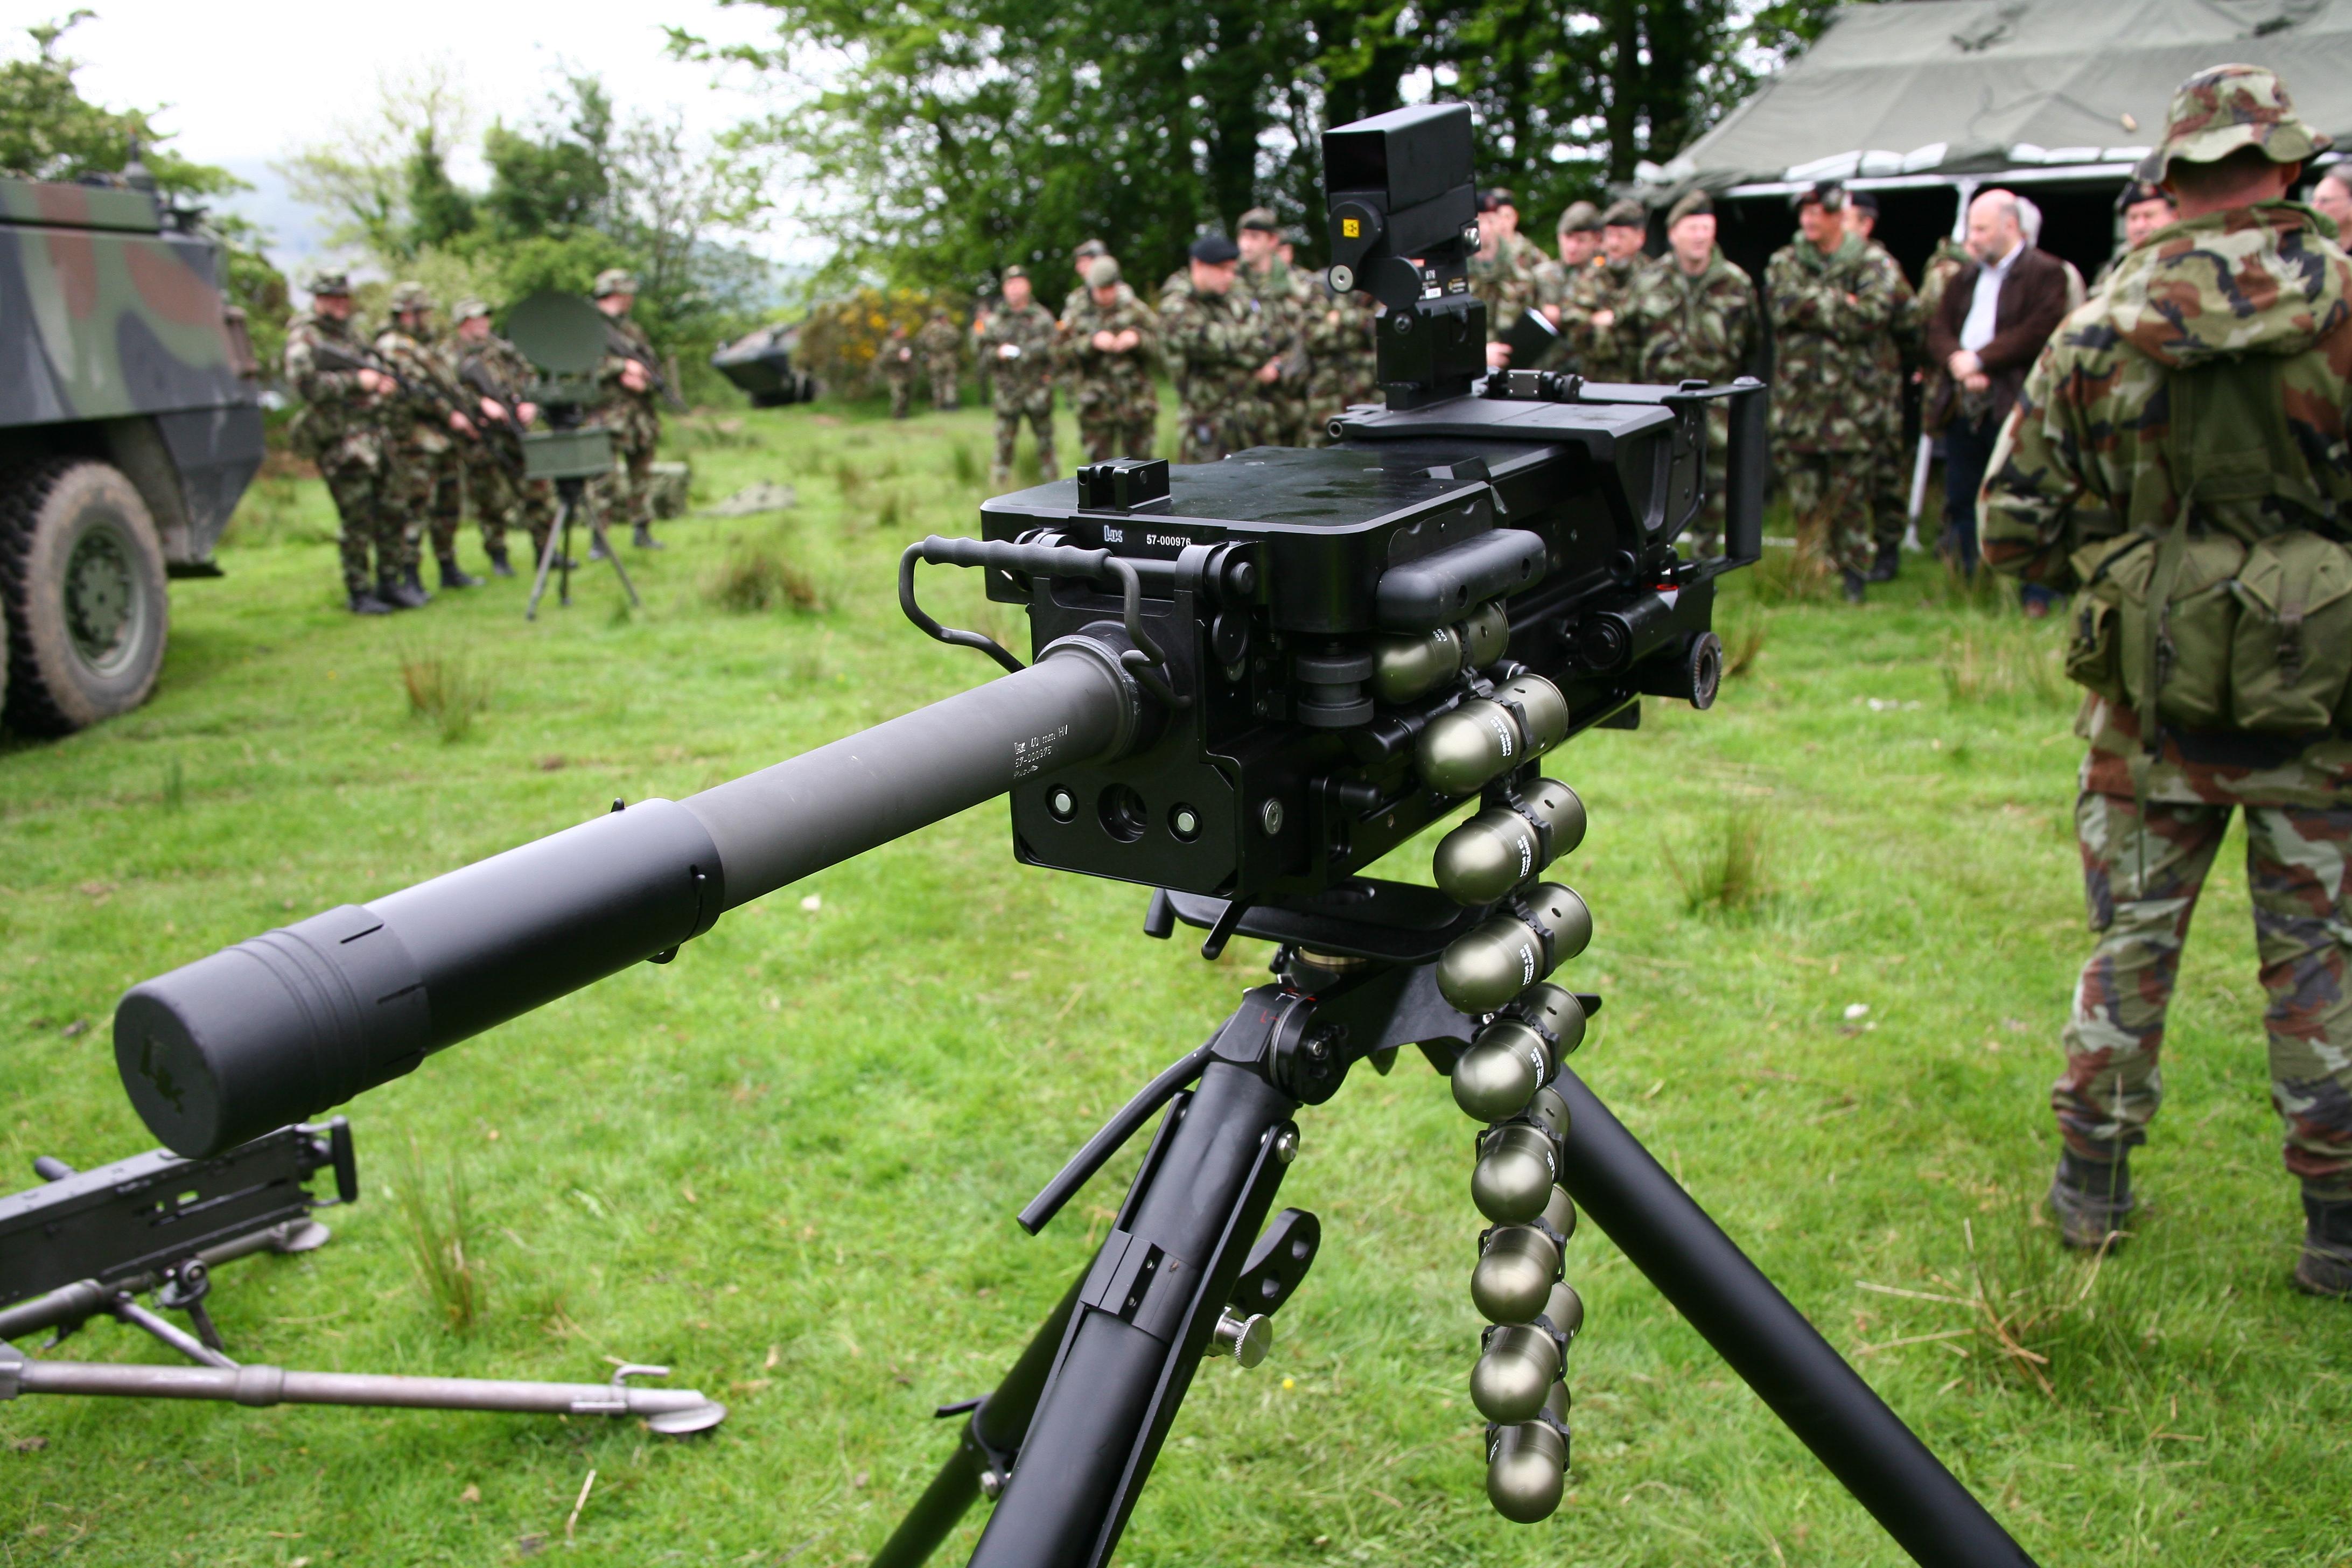 fileirish army grenade launcher 4109942104jpg